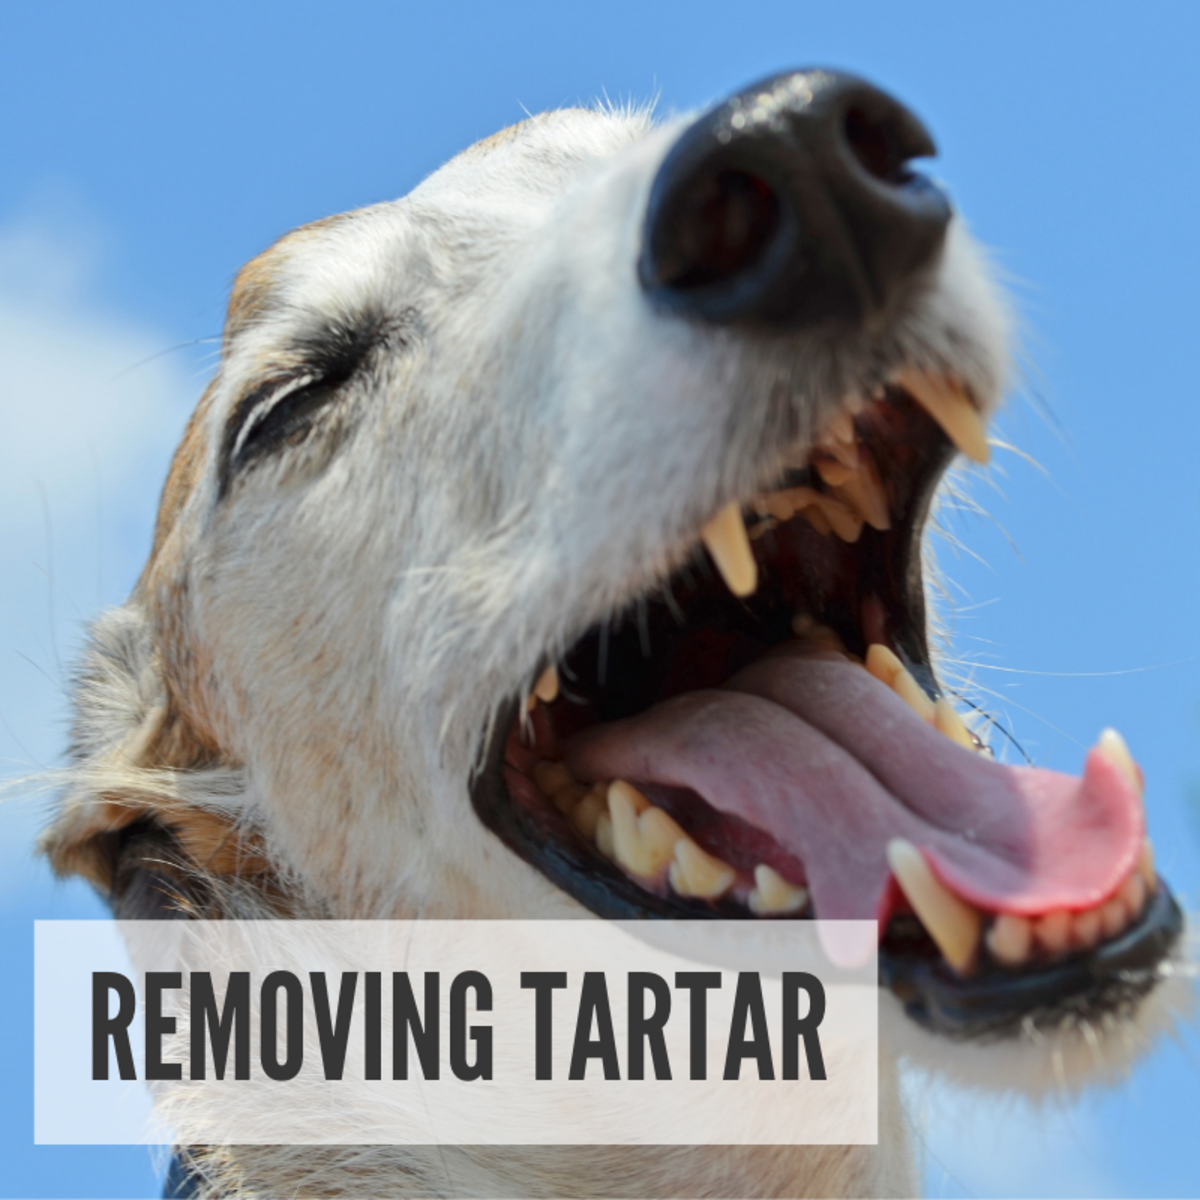 Removing Tartar